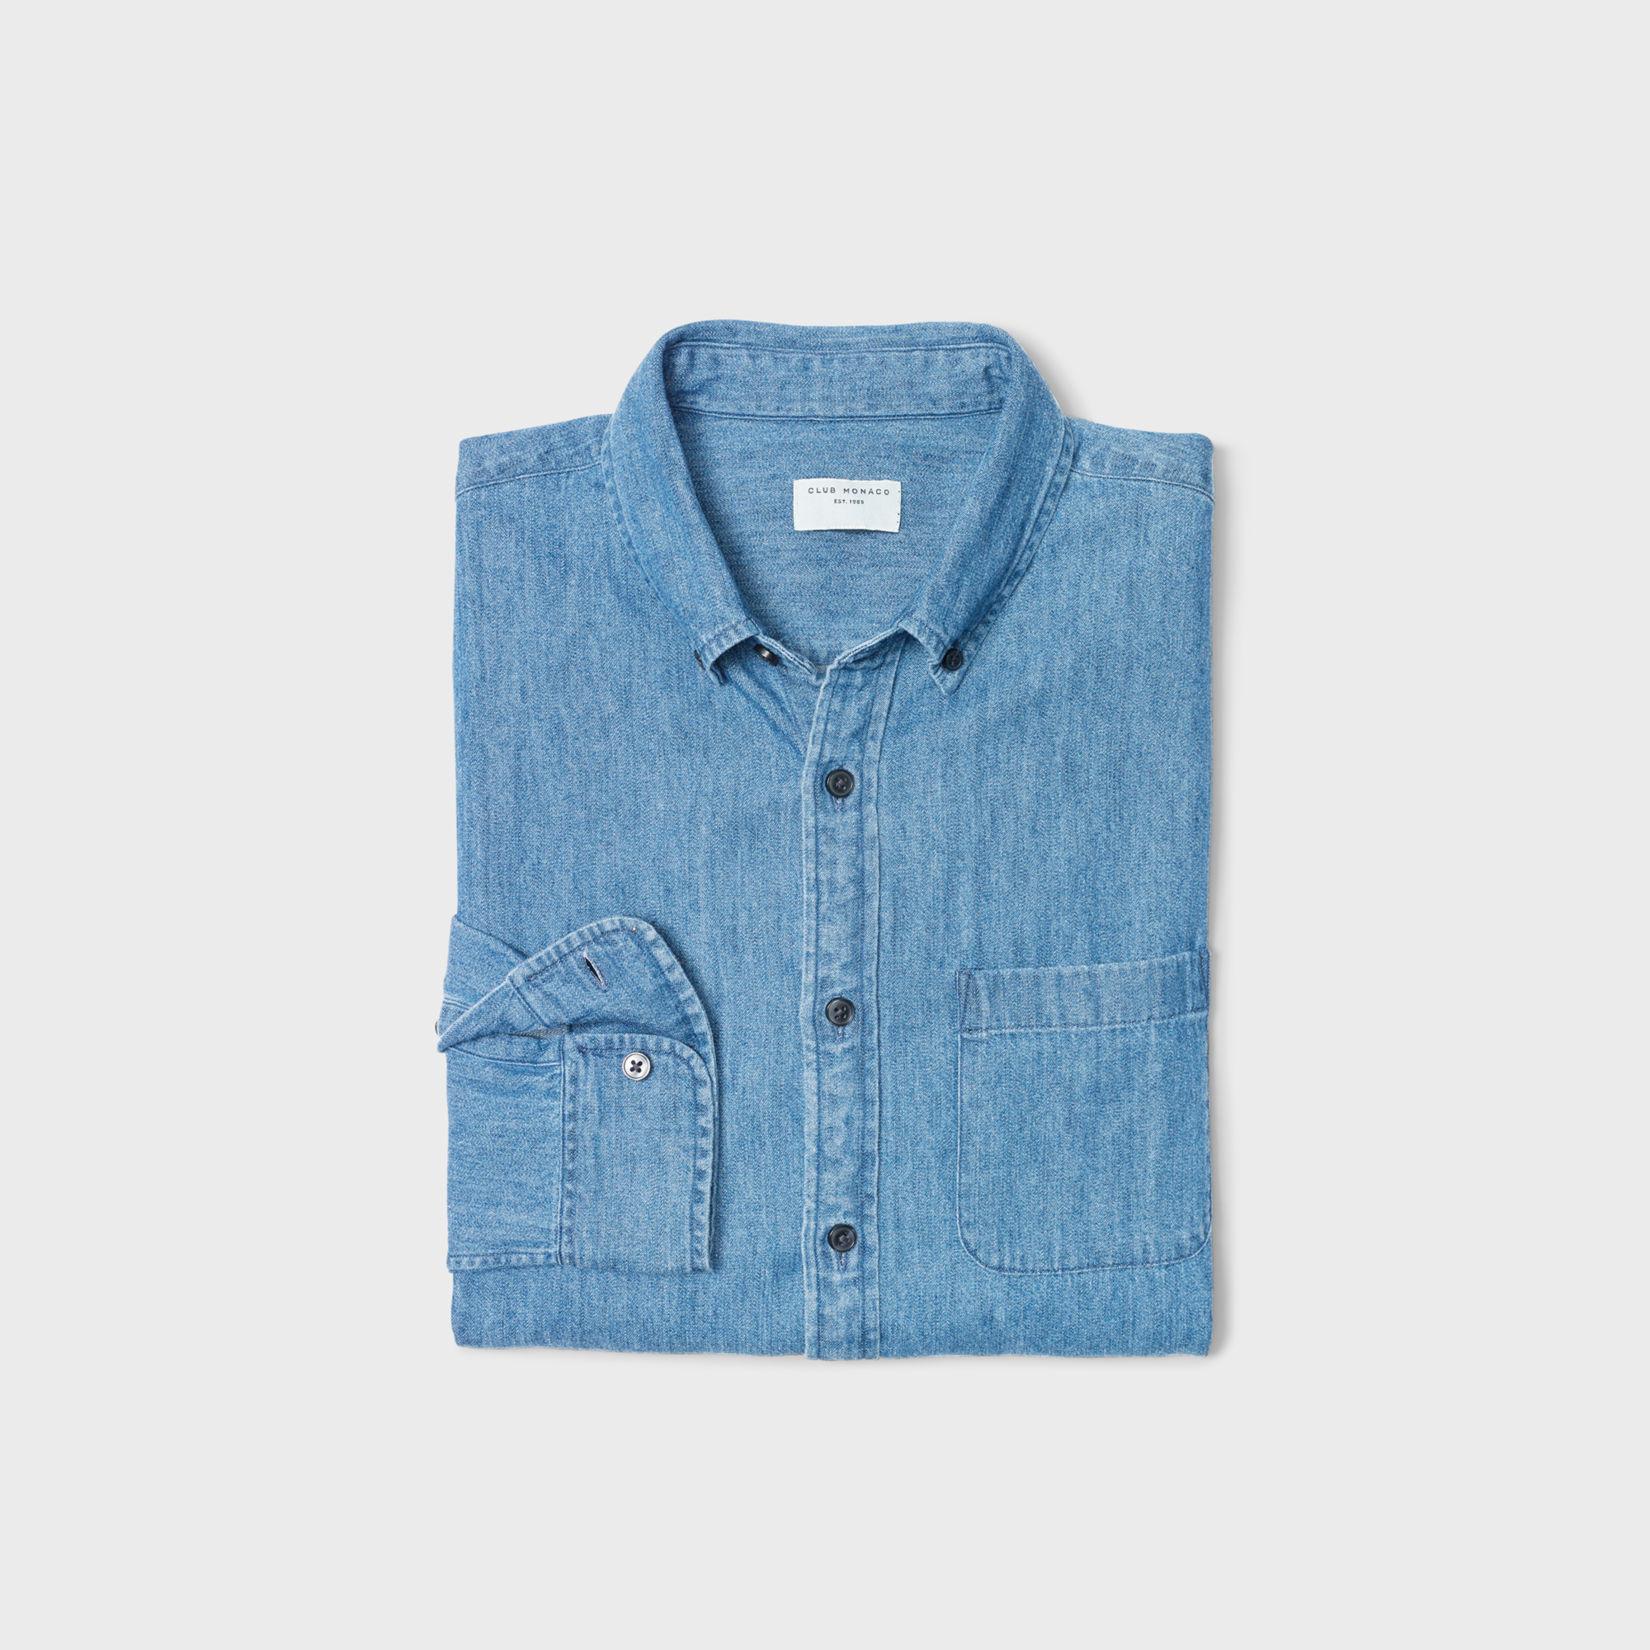 Men Shirts Chambray Shirts Flannel Shirts Plaid Shirts And